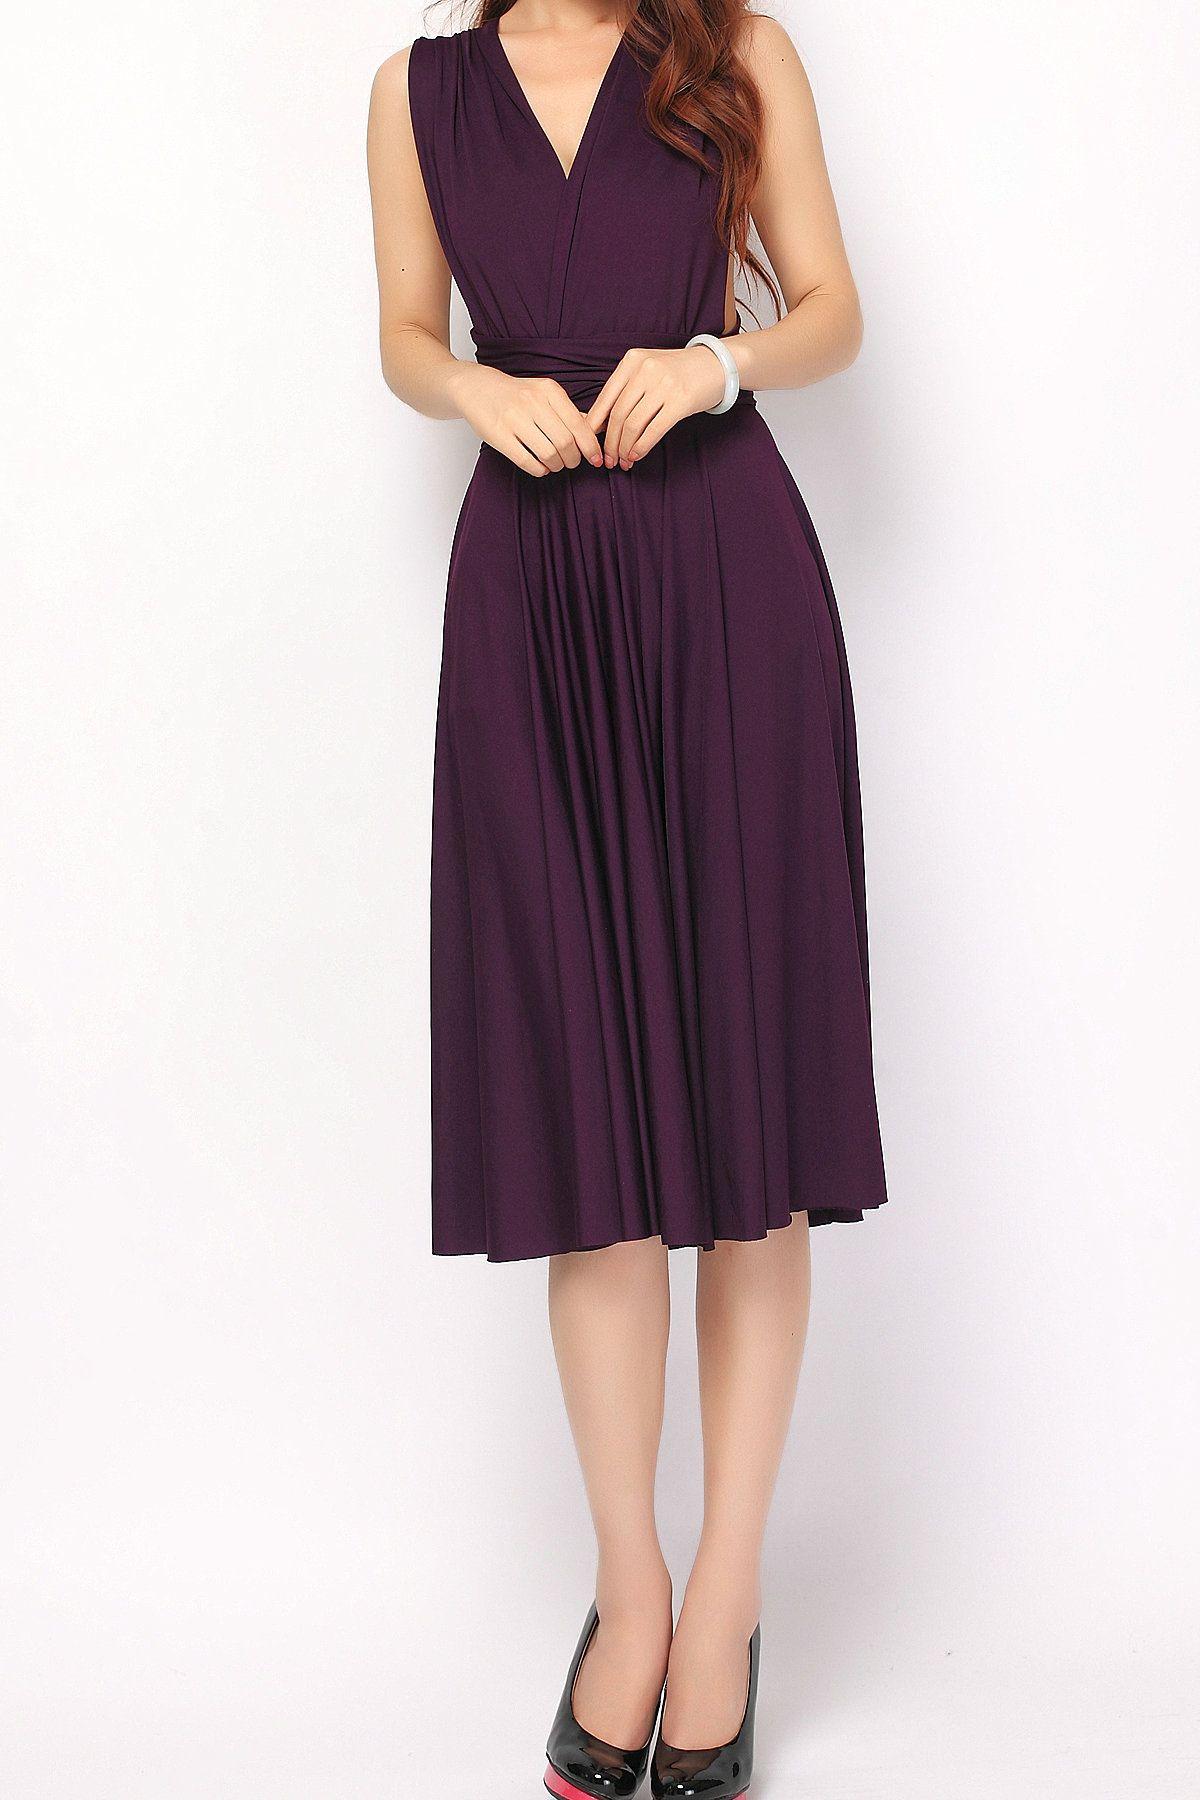 Eggplant Short Convertible Infinity Dress Bridesmaid Dress [st-17] - $49.50 :  Infinity Dress | Convertible Dress Bridesmaid Dresses Online, TinnaInfinityDress